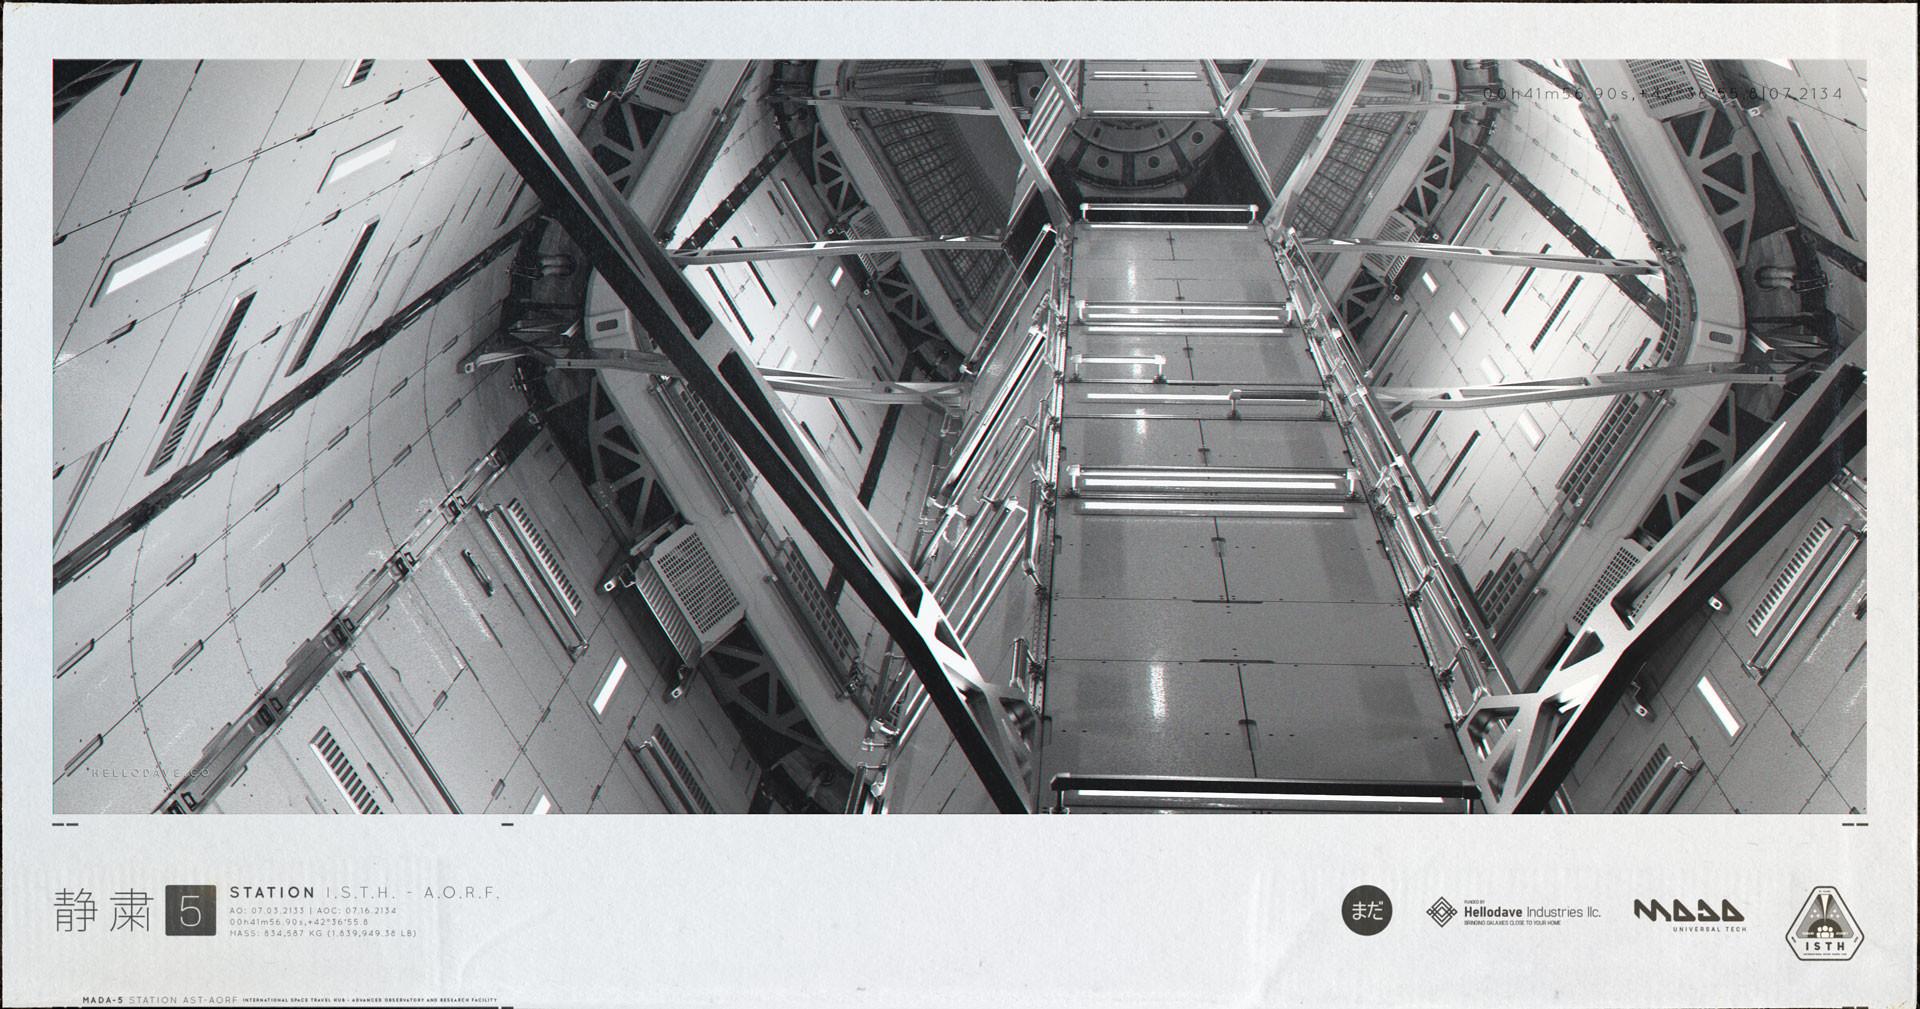 Davison carvalho station horizontal mon 02a